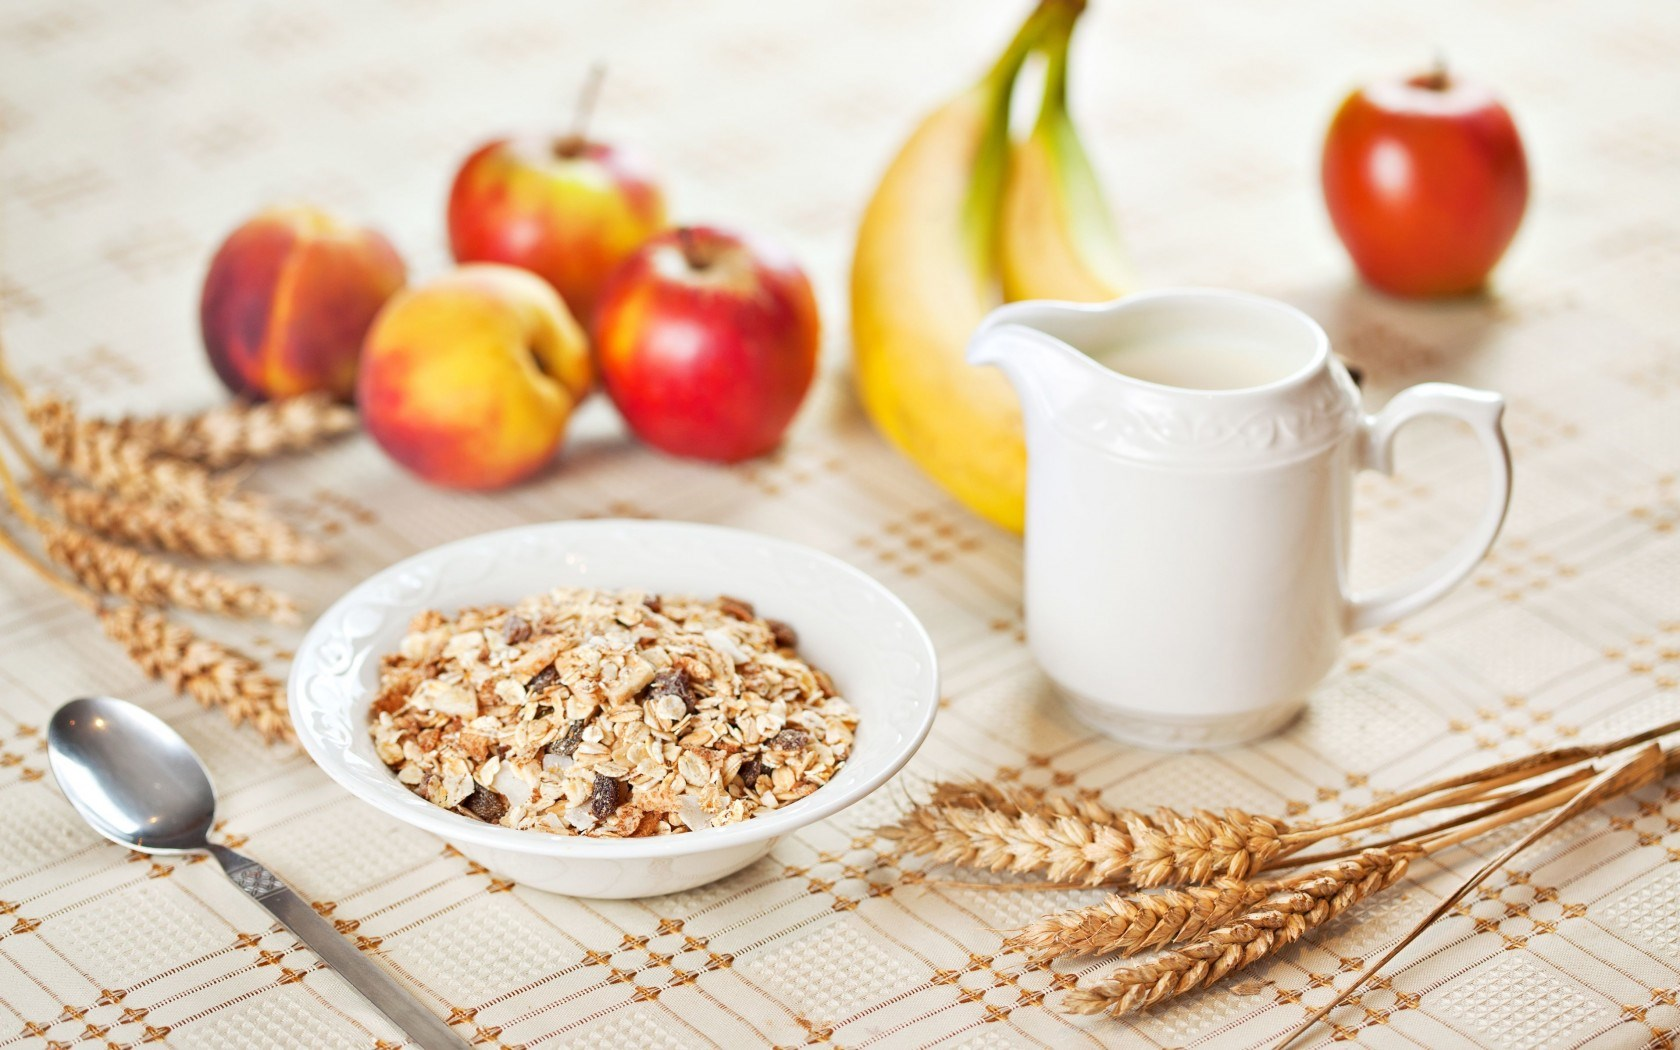 Food Breakfast Apples Bananas Wheat